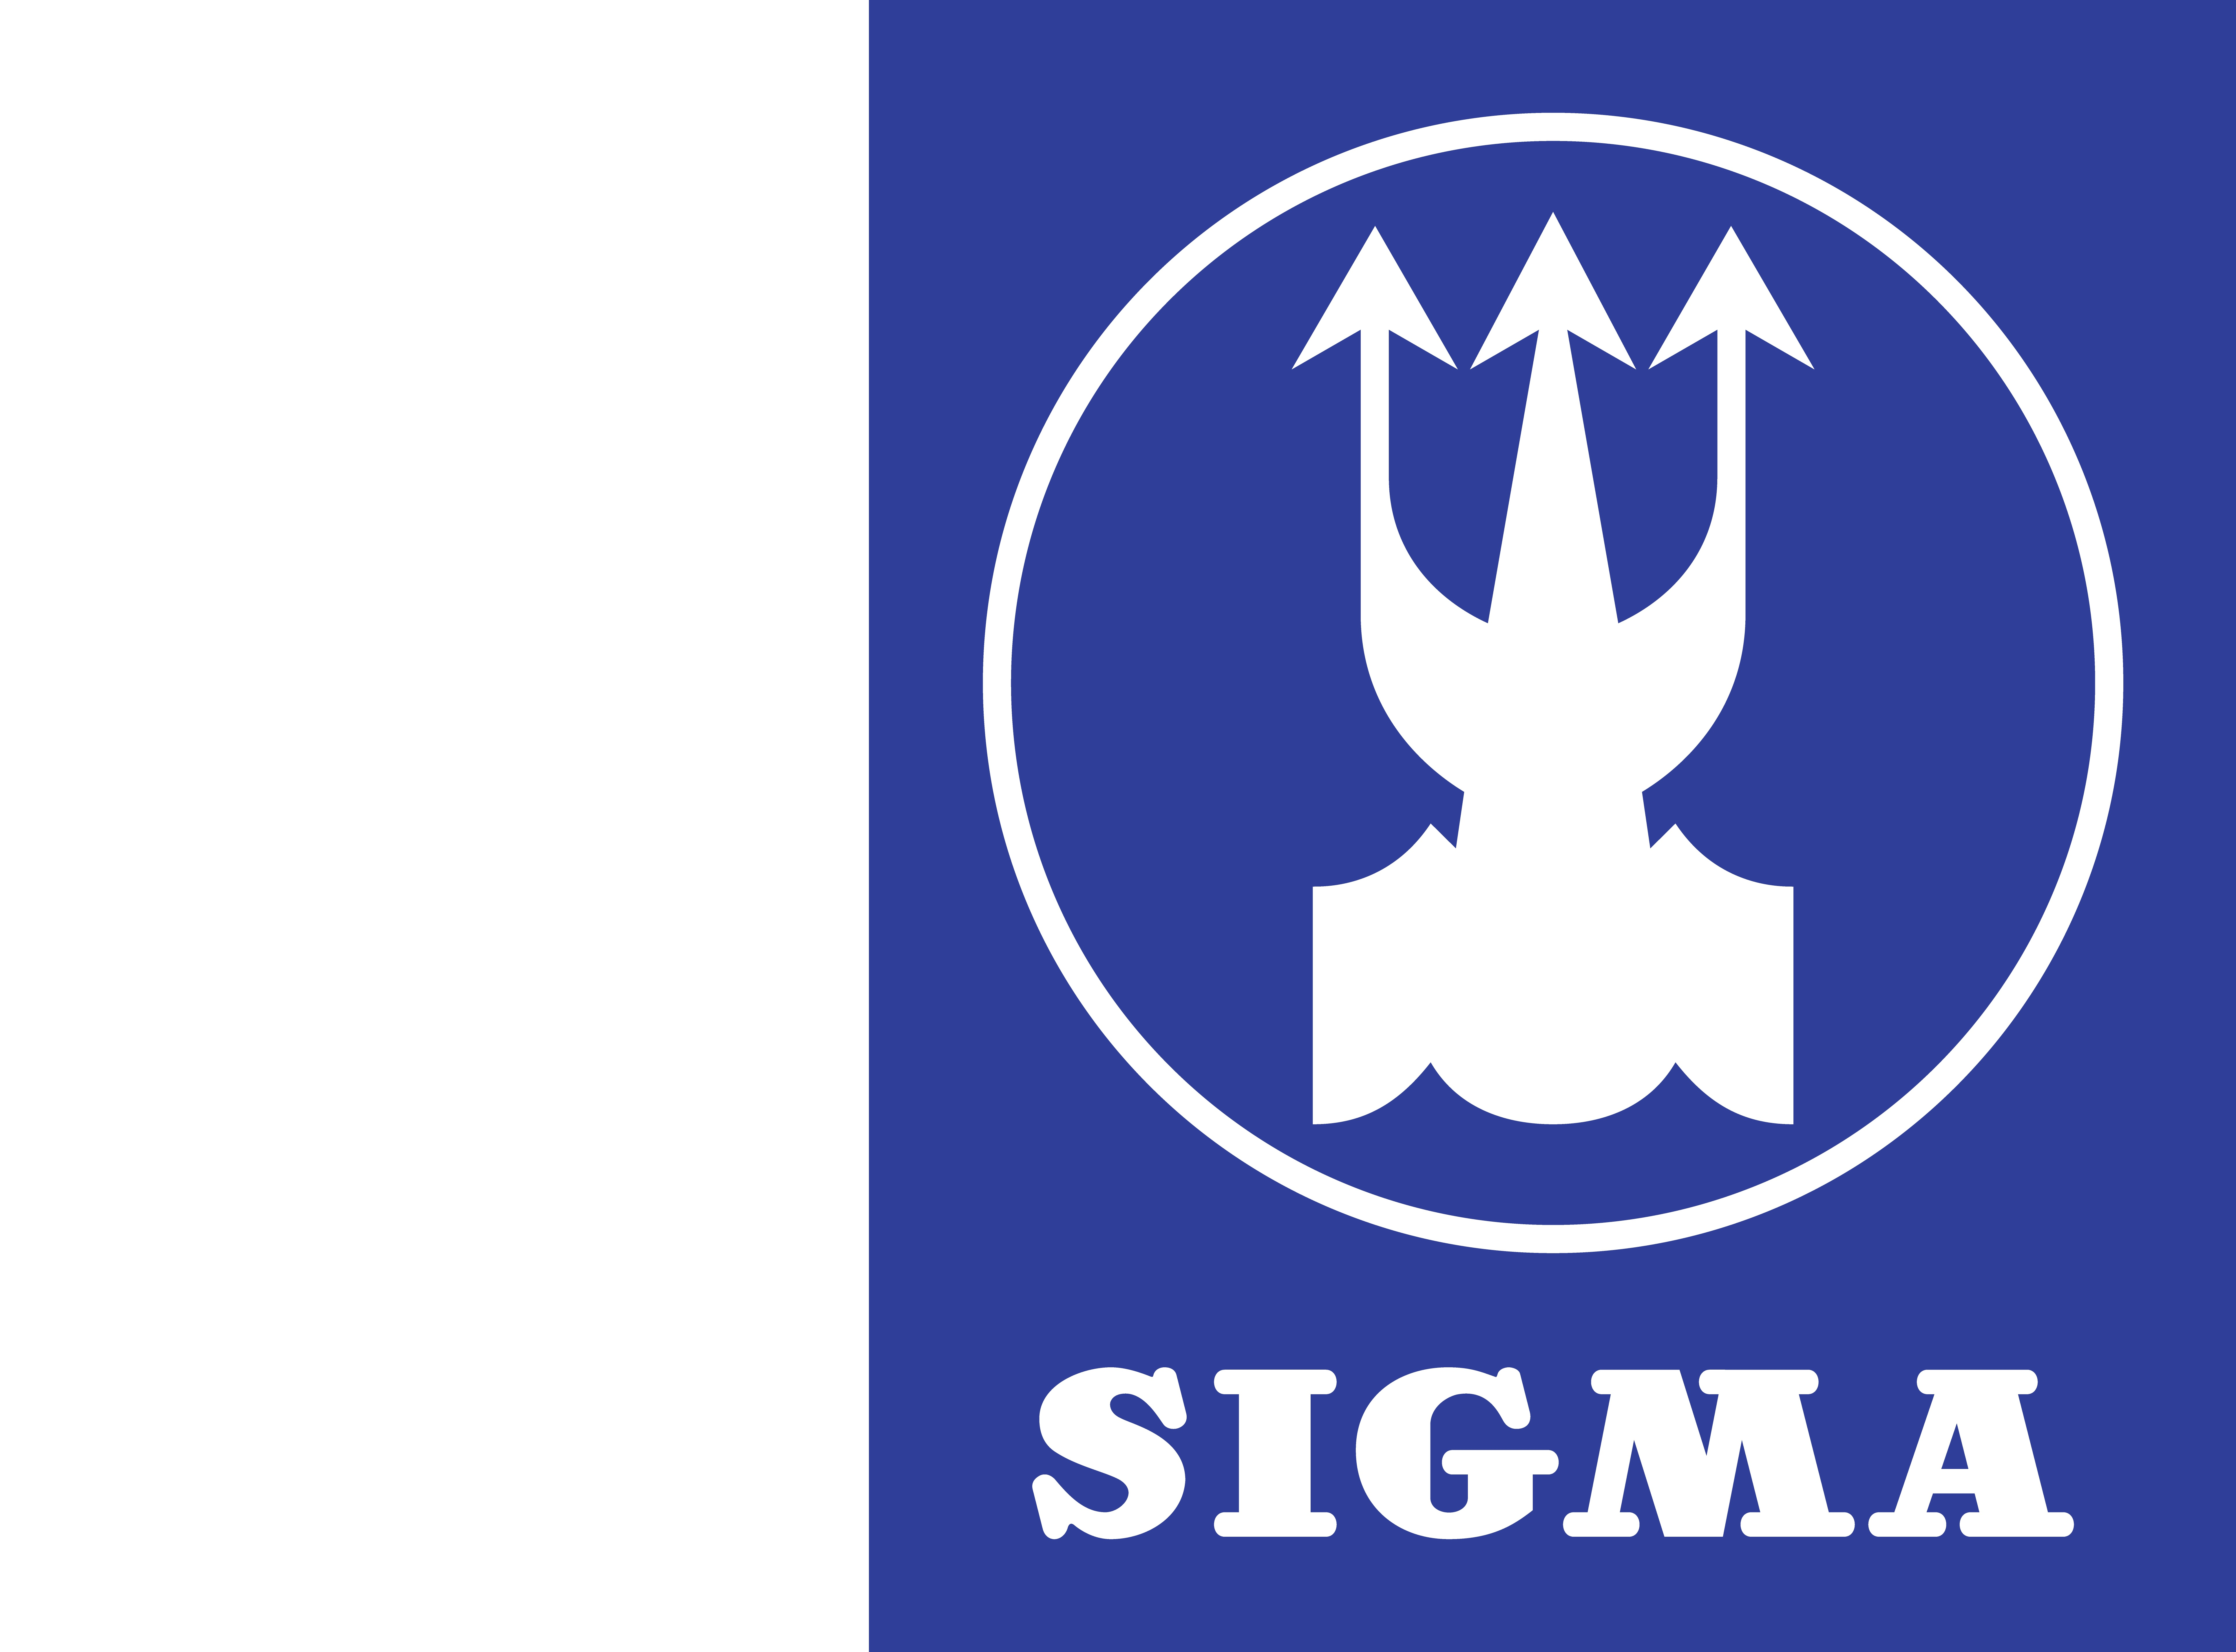 www.leroyal.cz - logo